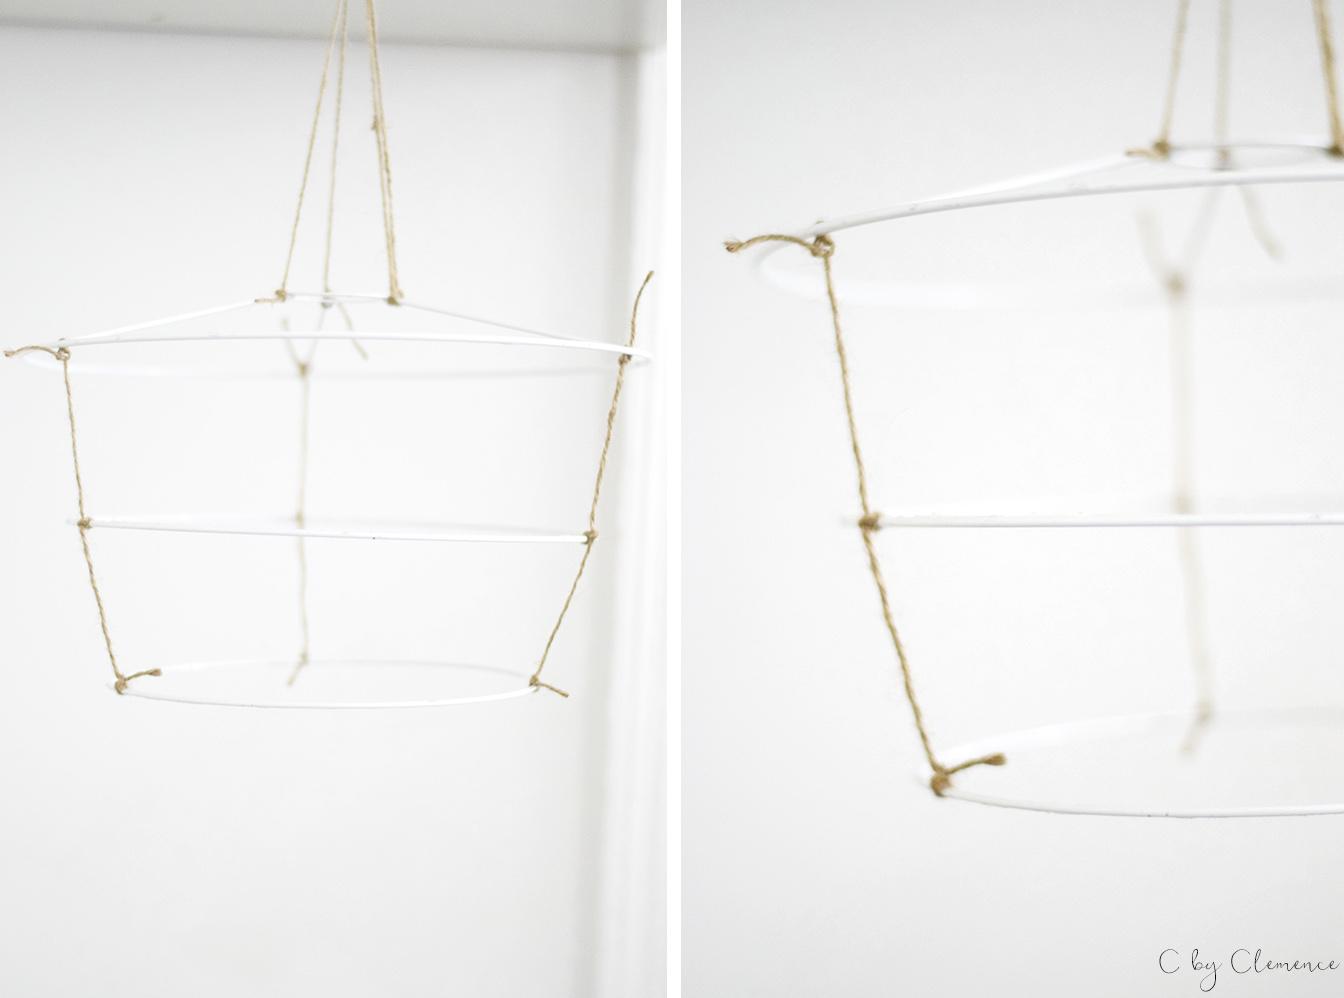 DIY LUSTRE A FRANGES cbyclemence.com 02